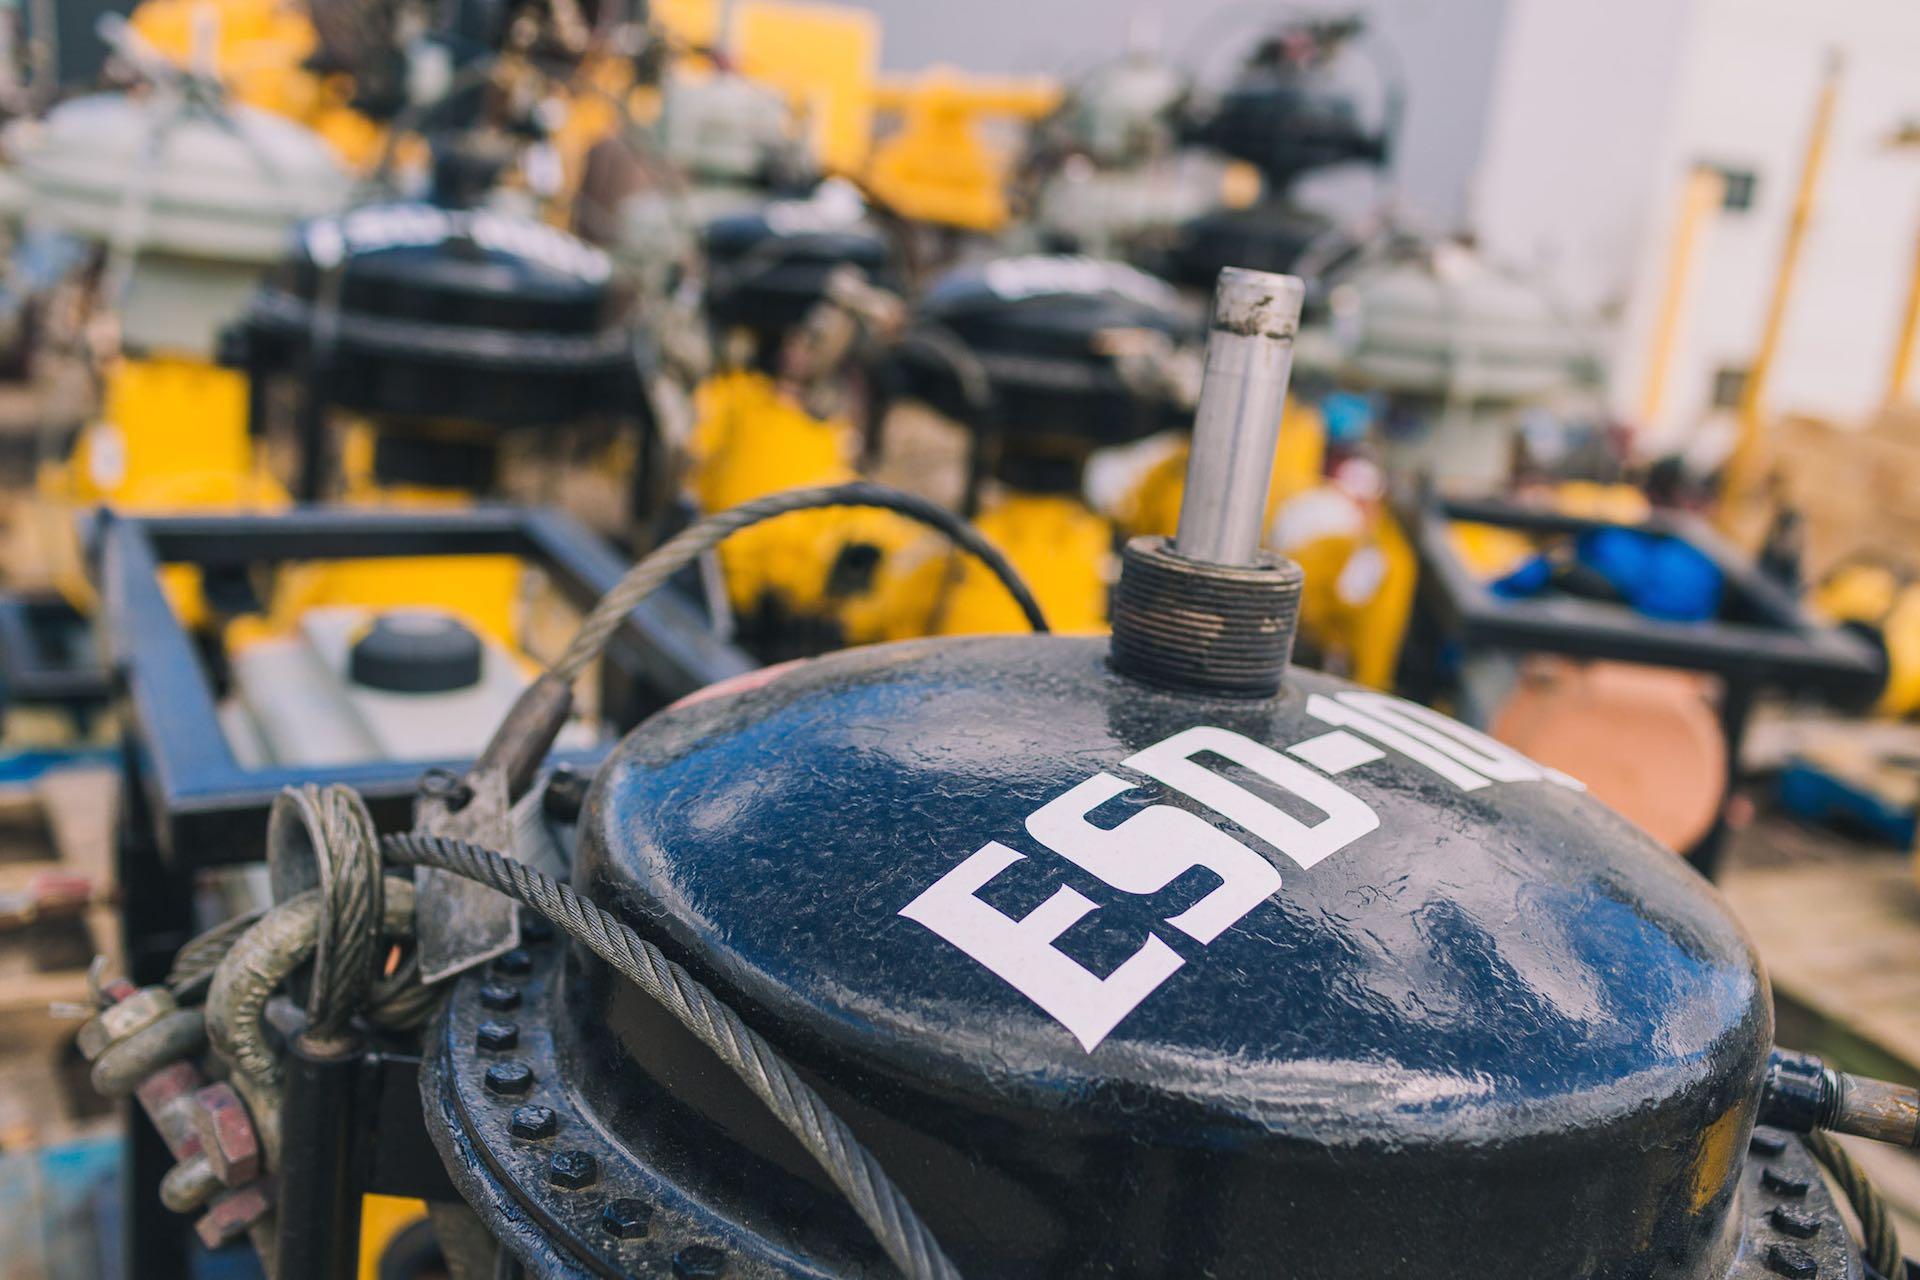 Oilfield rental equipment, 10k rentals, oilfield equipment